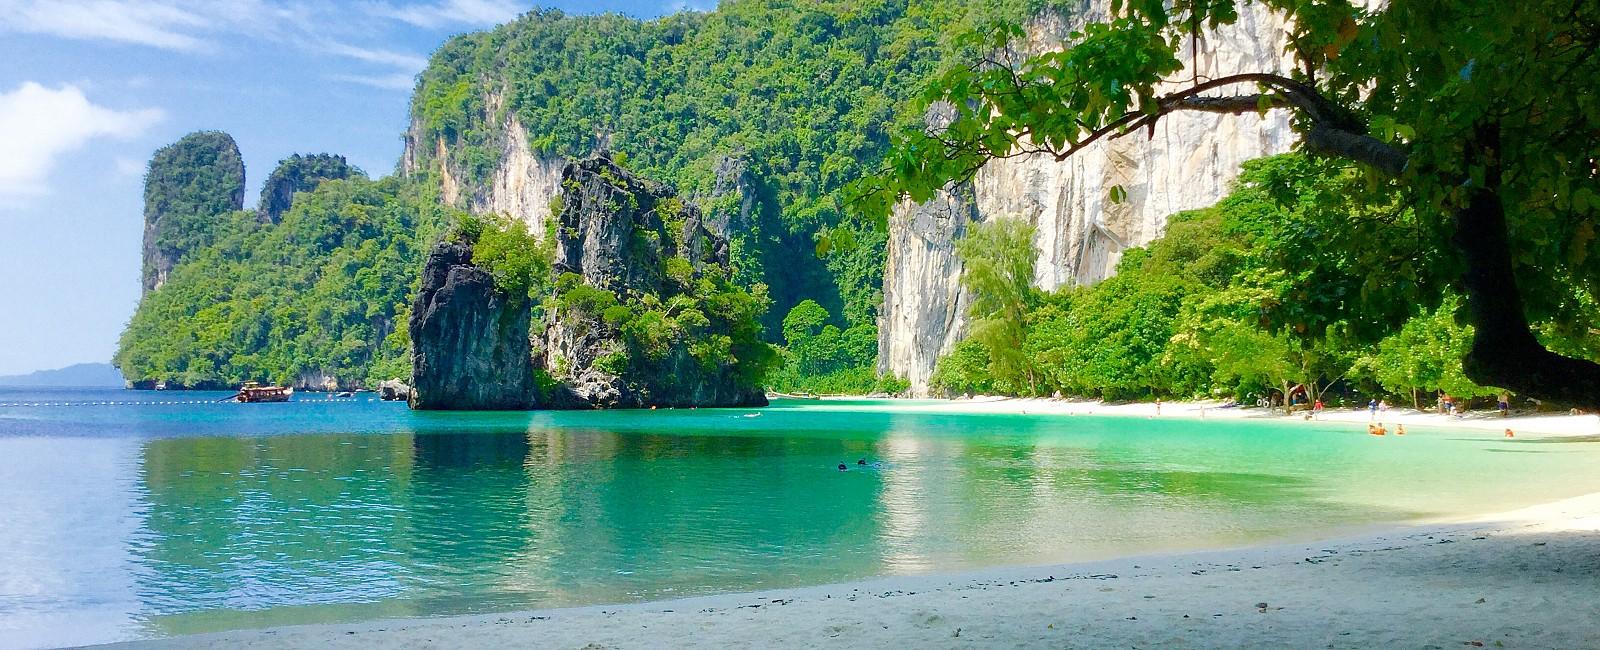 4 Island - YAO YAI Island and 3 Khai Island Tour By Speedboat